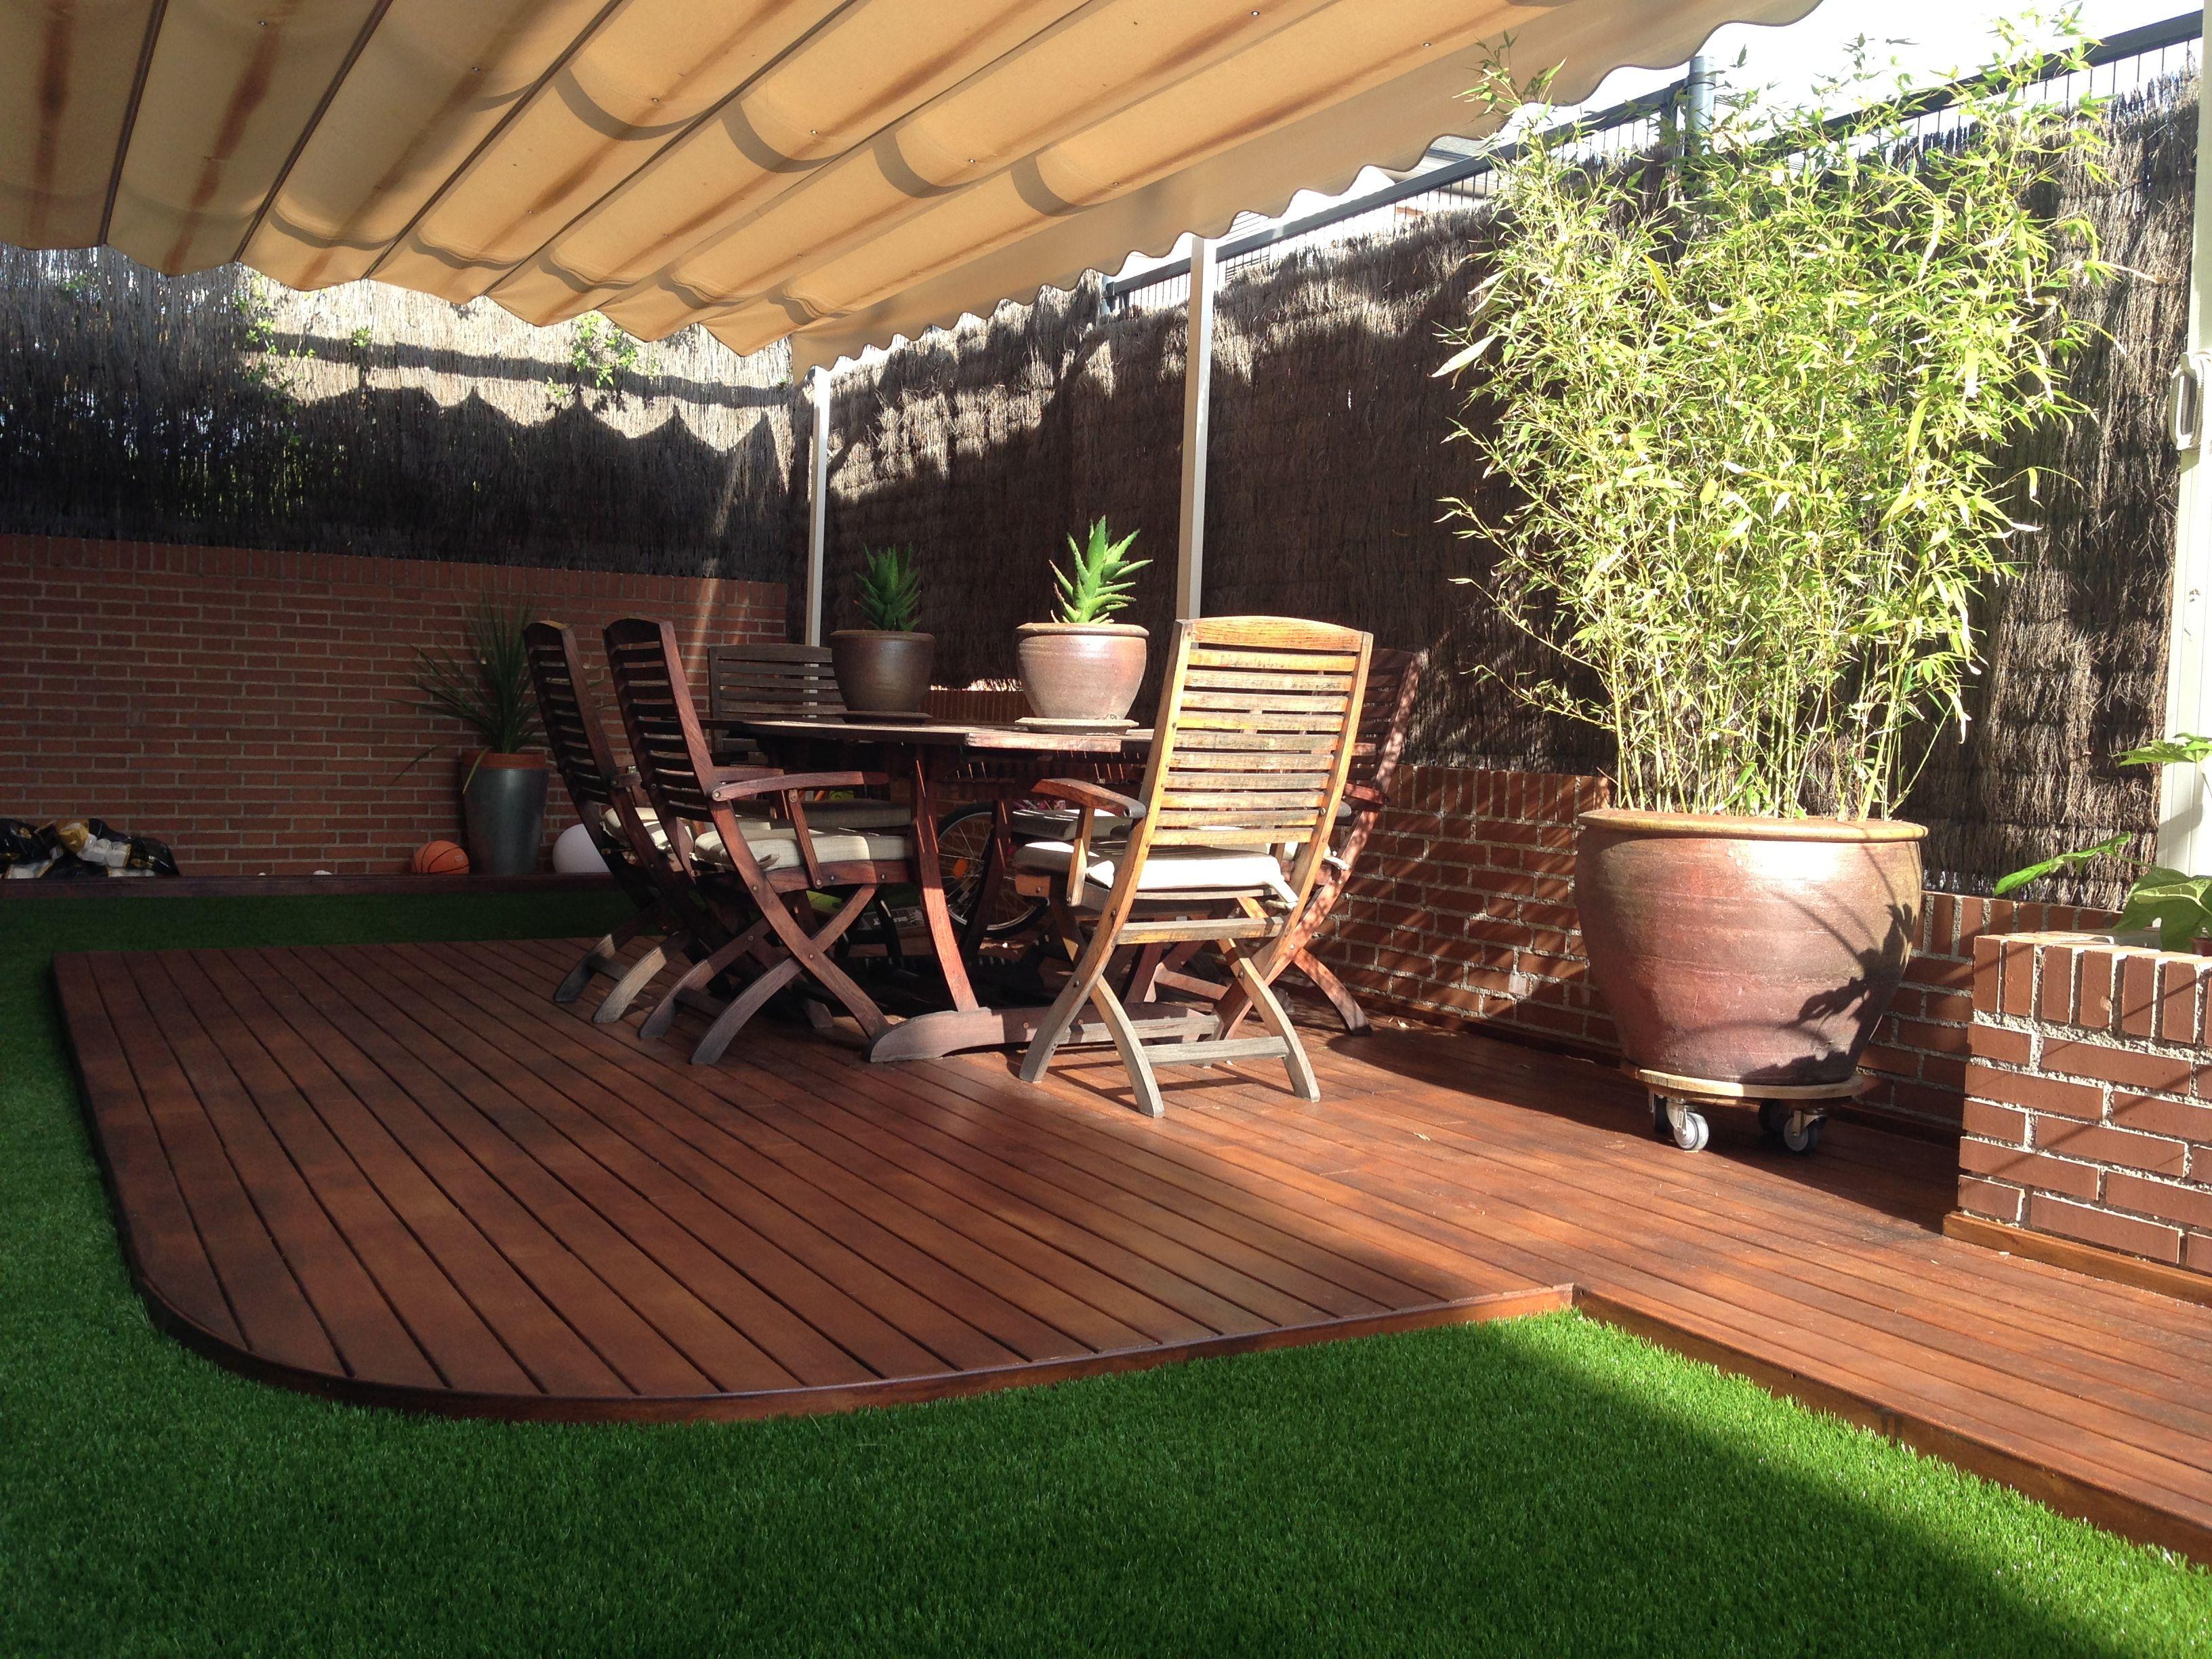 Pin de katherine espa a en house 39 s en 2019 terrazas for Diseno de patios y terrazas